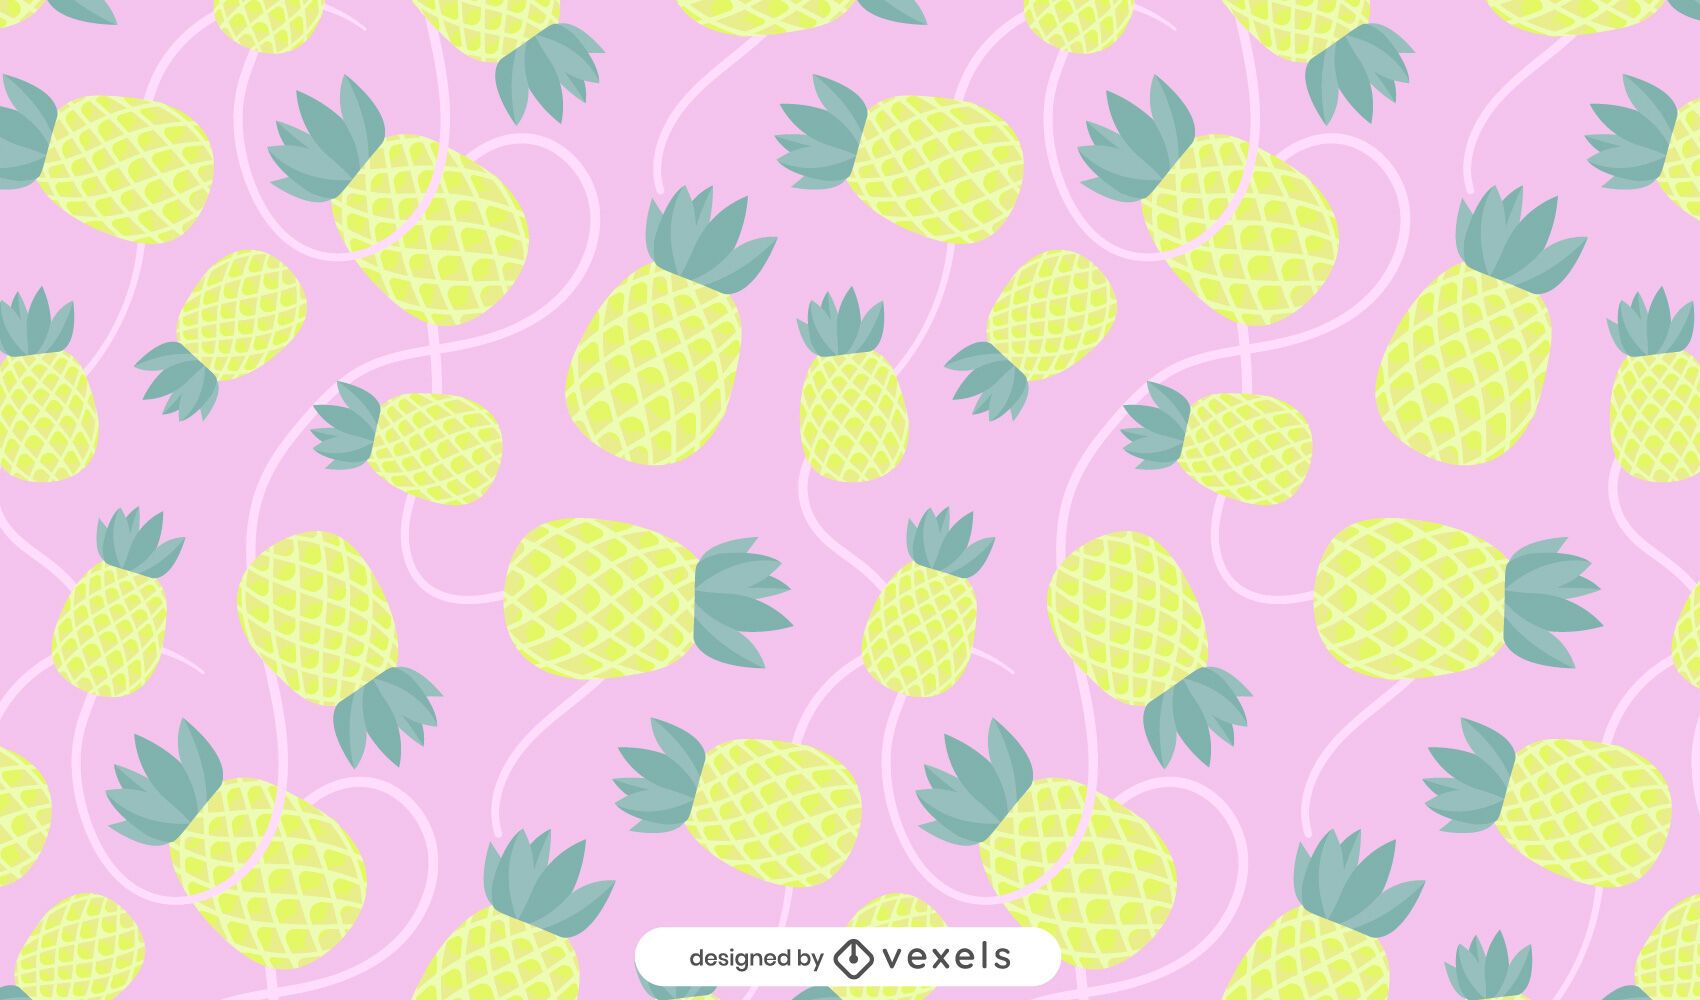 Flat pineapples pattern design